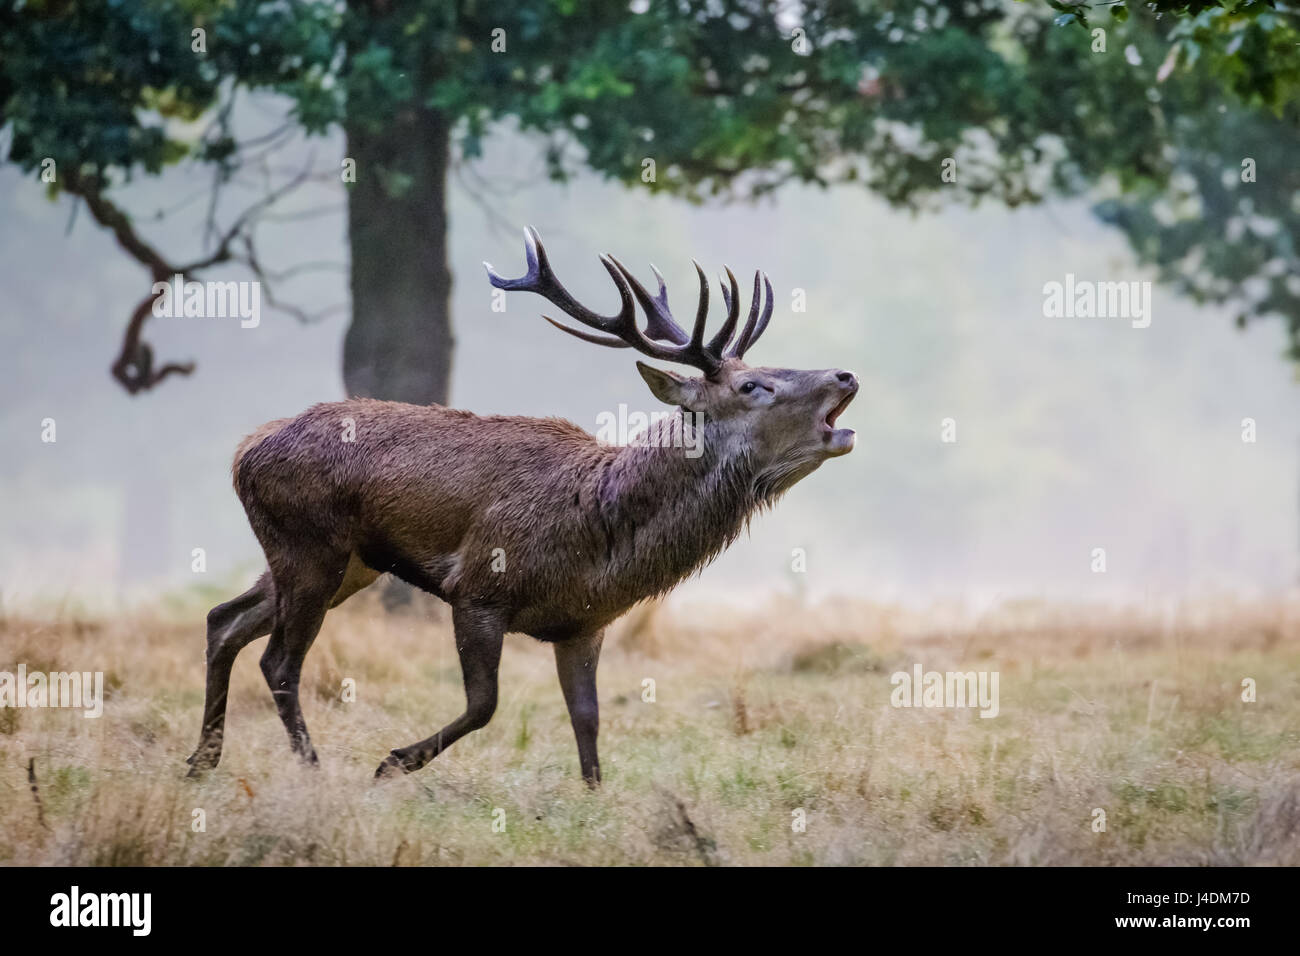 Red Deer rut (Cervus elaphus) stag running and roaring calling or bugling - Stock Image